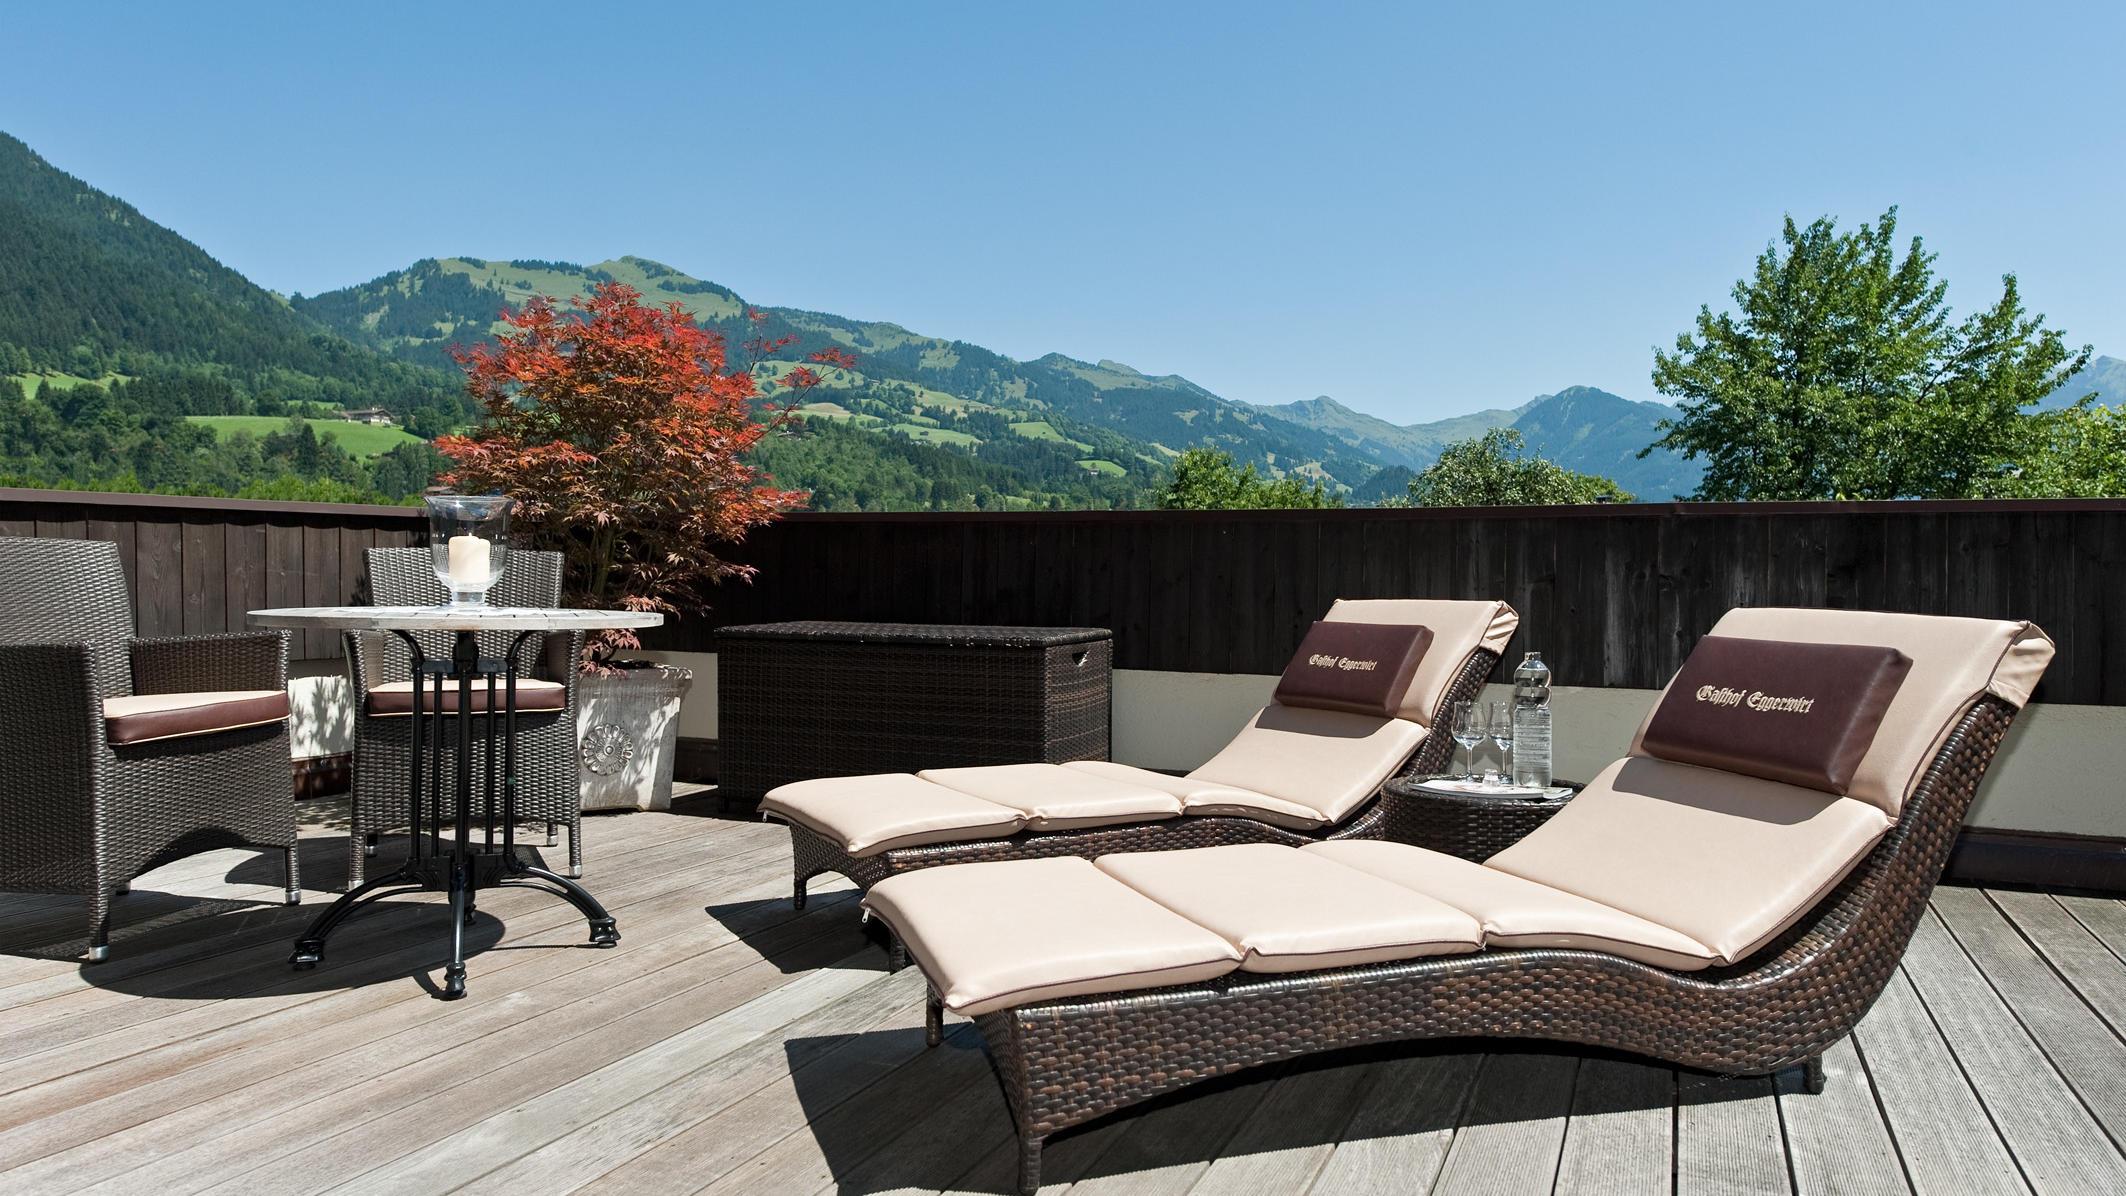 Junior Suite Terrace at Gasthof Eggerwirt Hotel in Kitzbühel, Austria